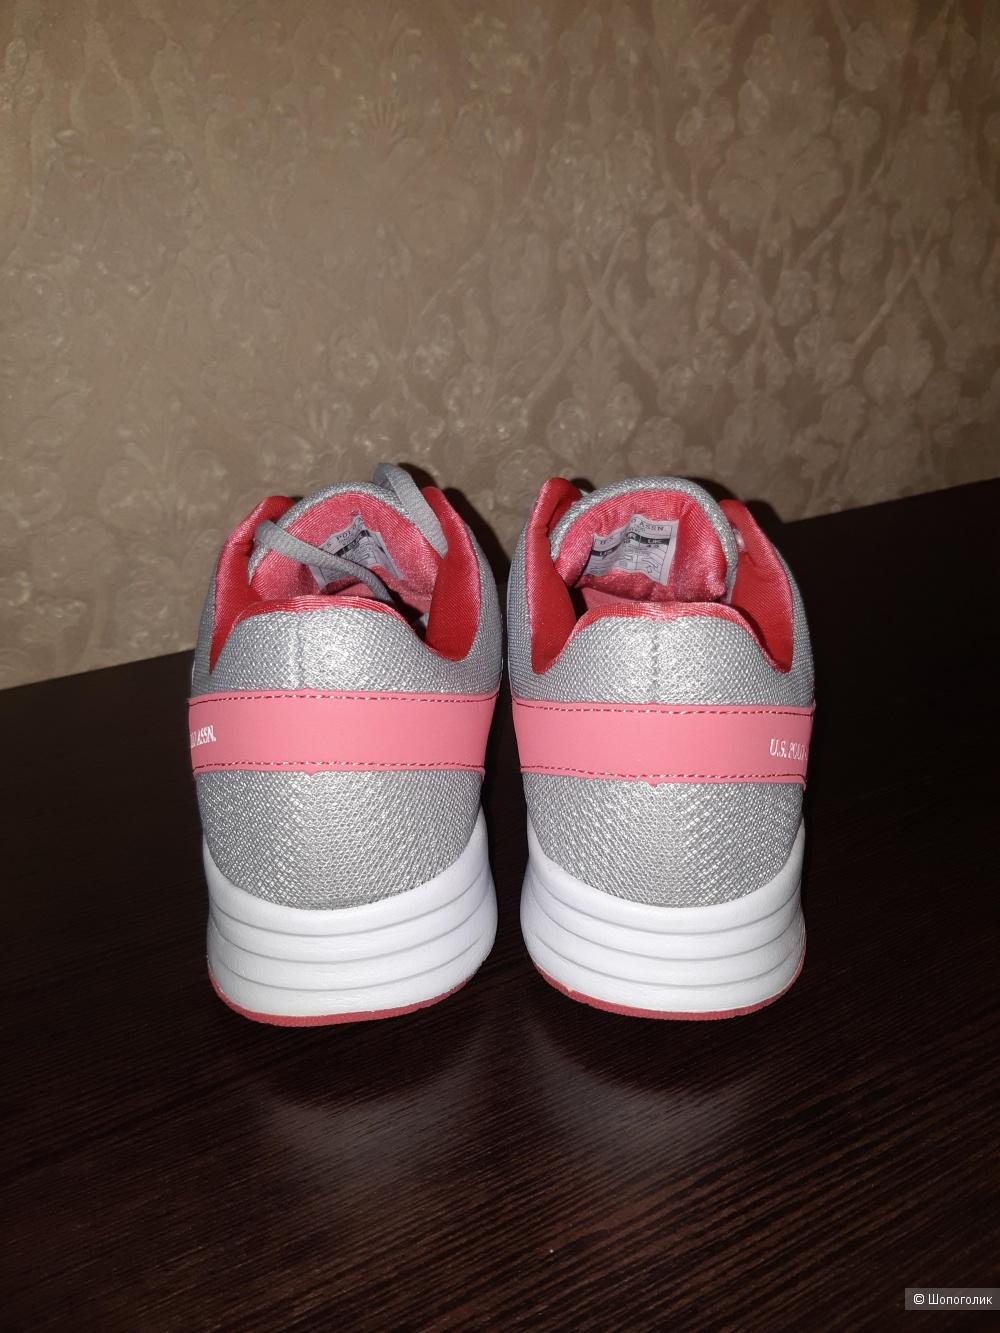 Новые кроссовки us polo, размер eur38